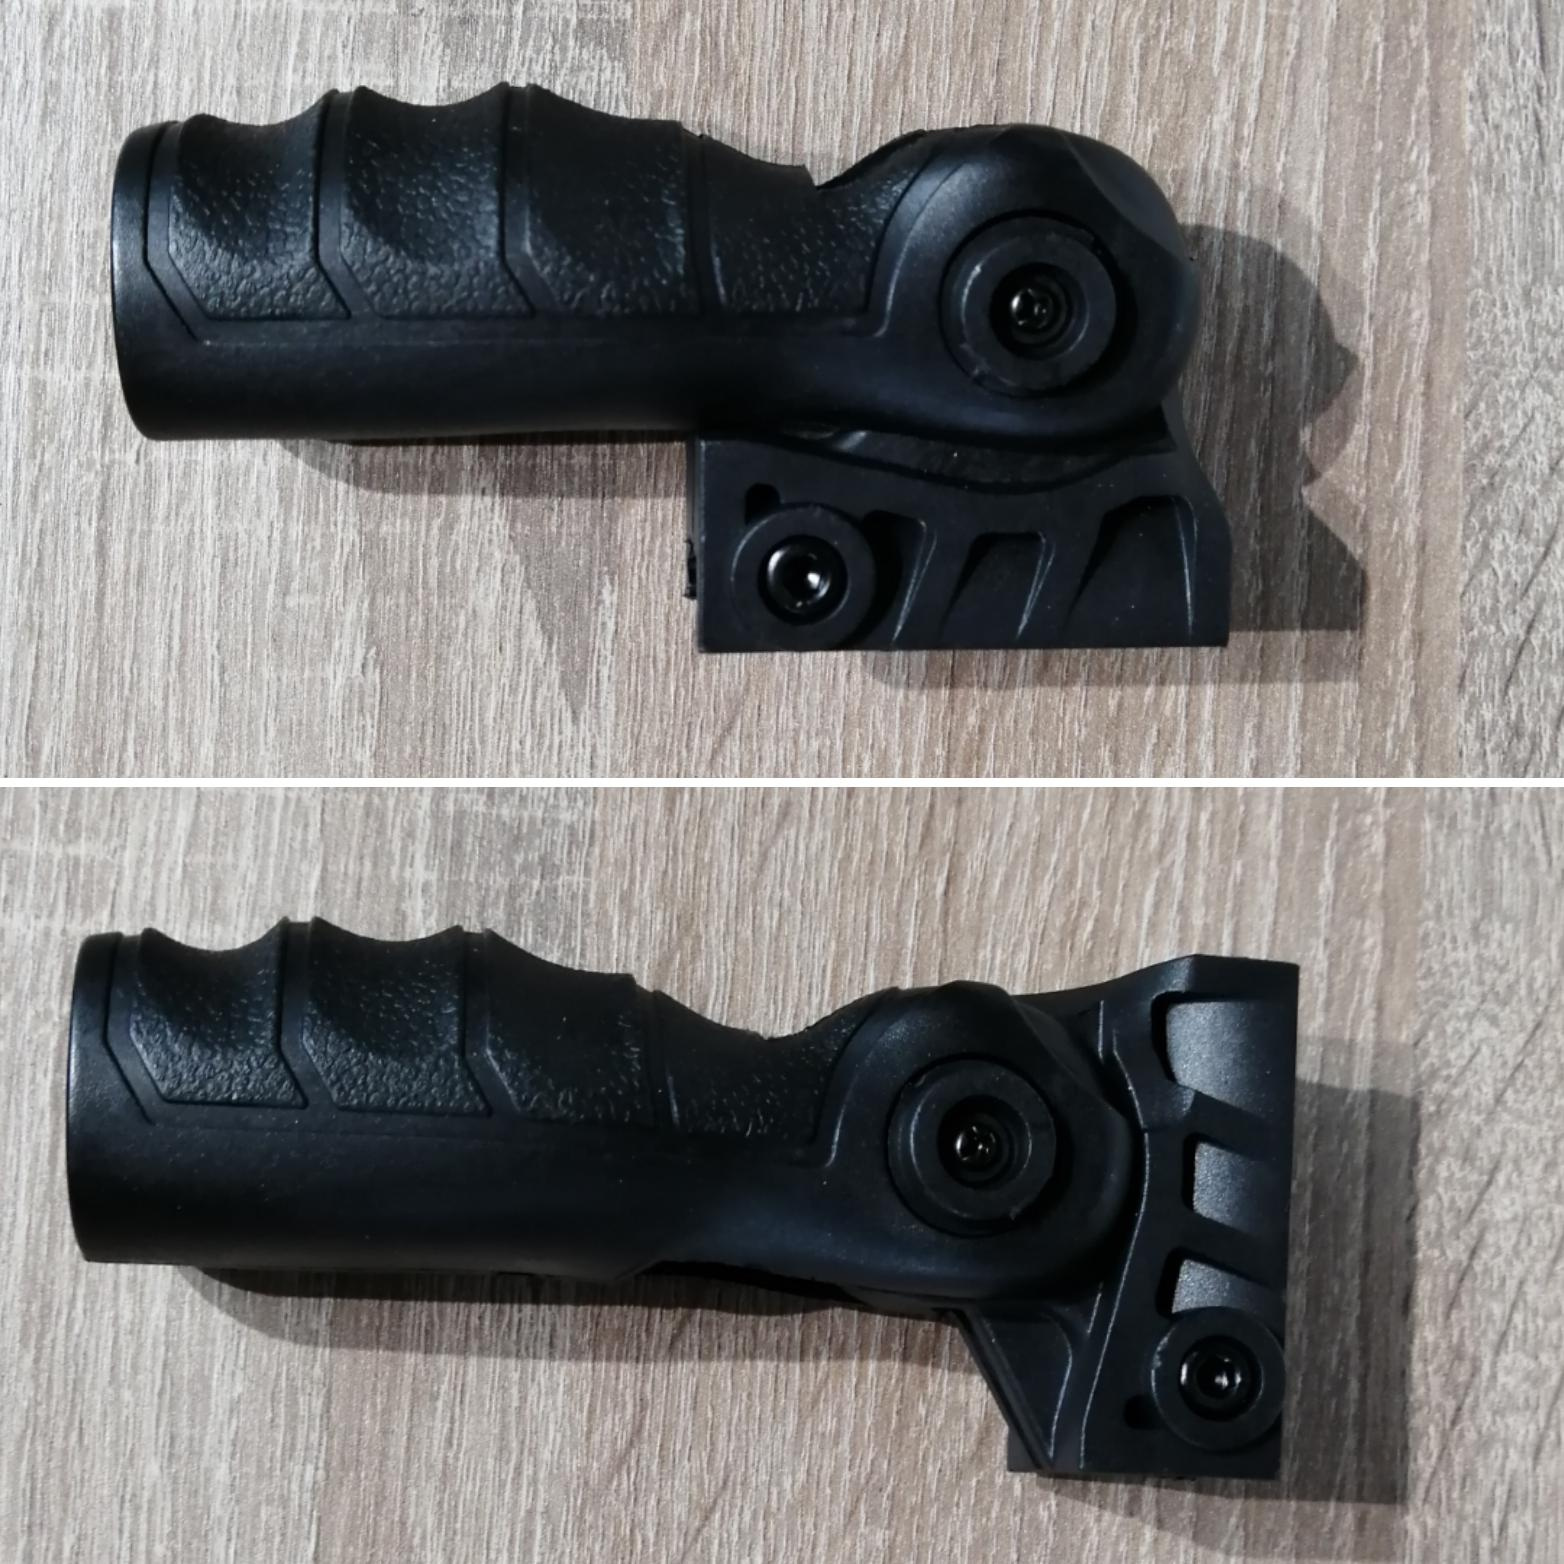 Empuñadura plegable - 6 posiciones